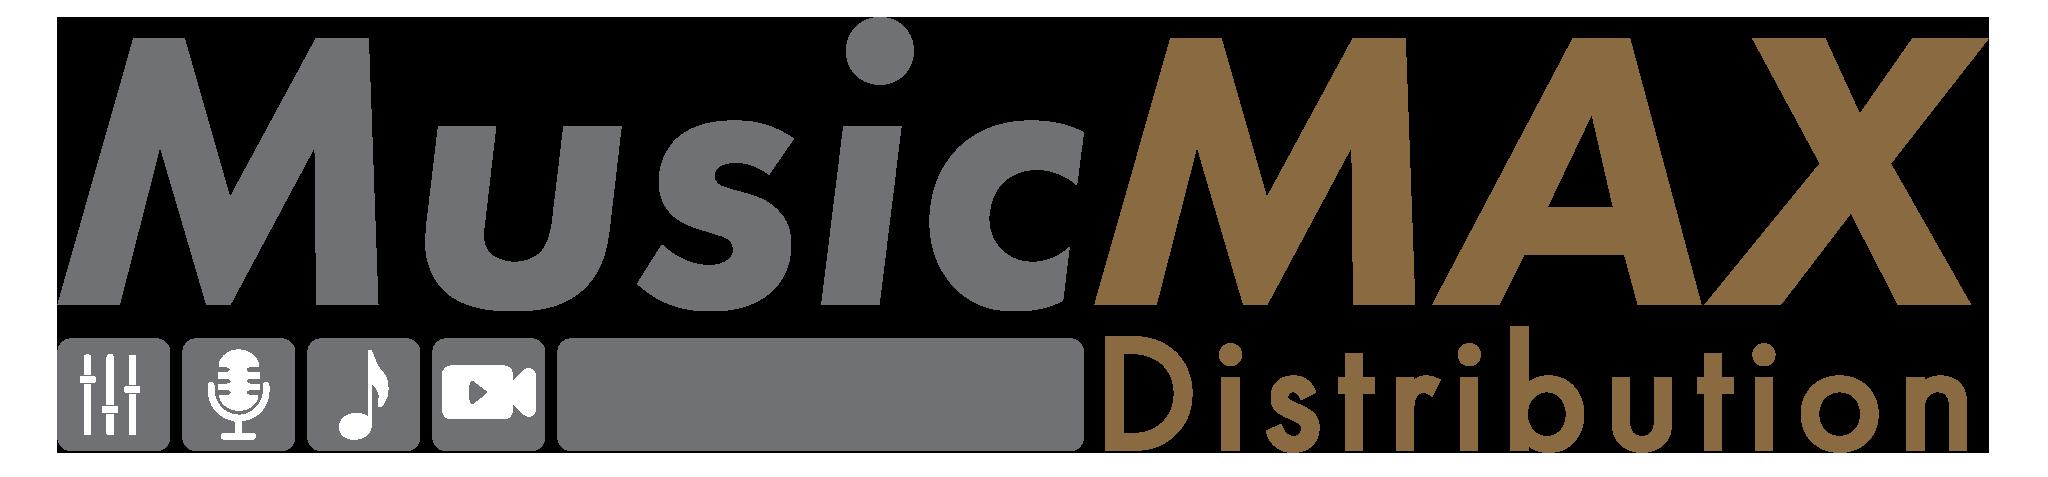 MusicMax Distribution